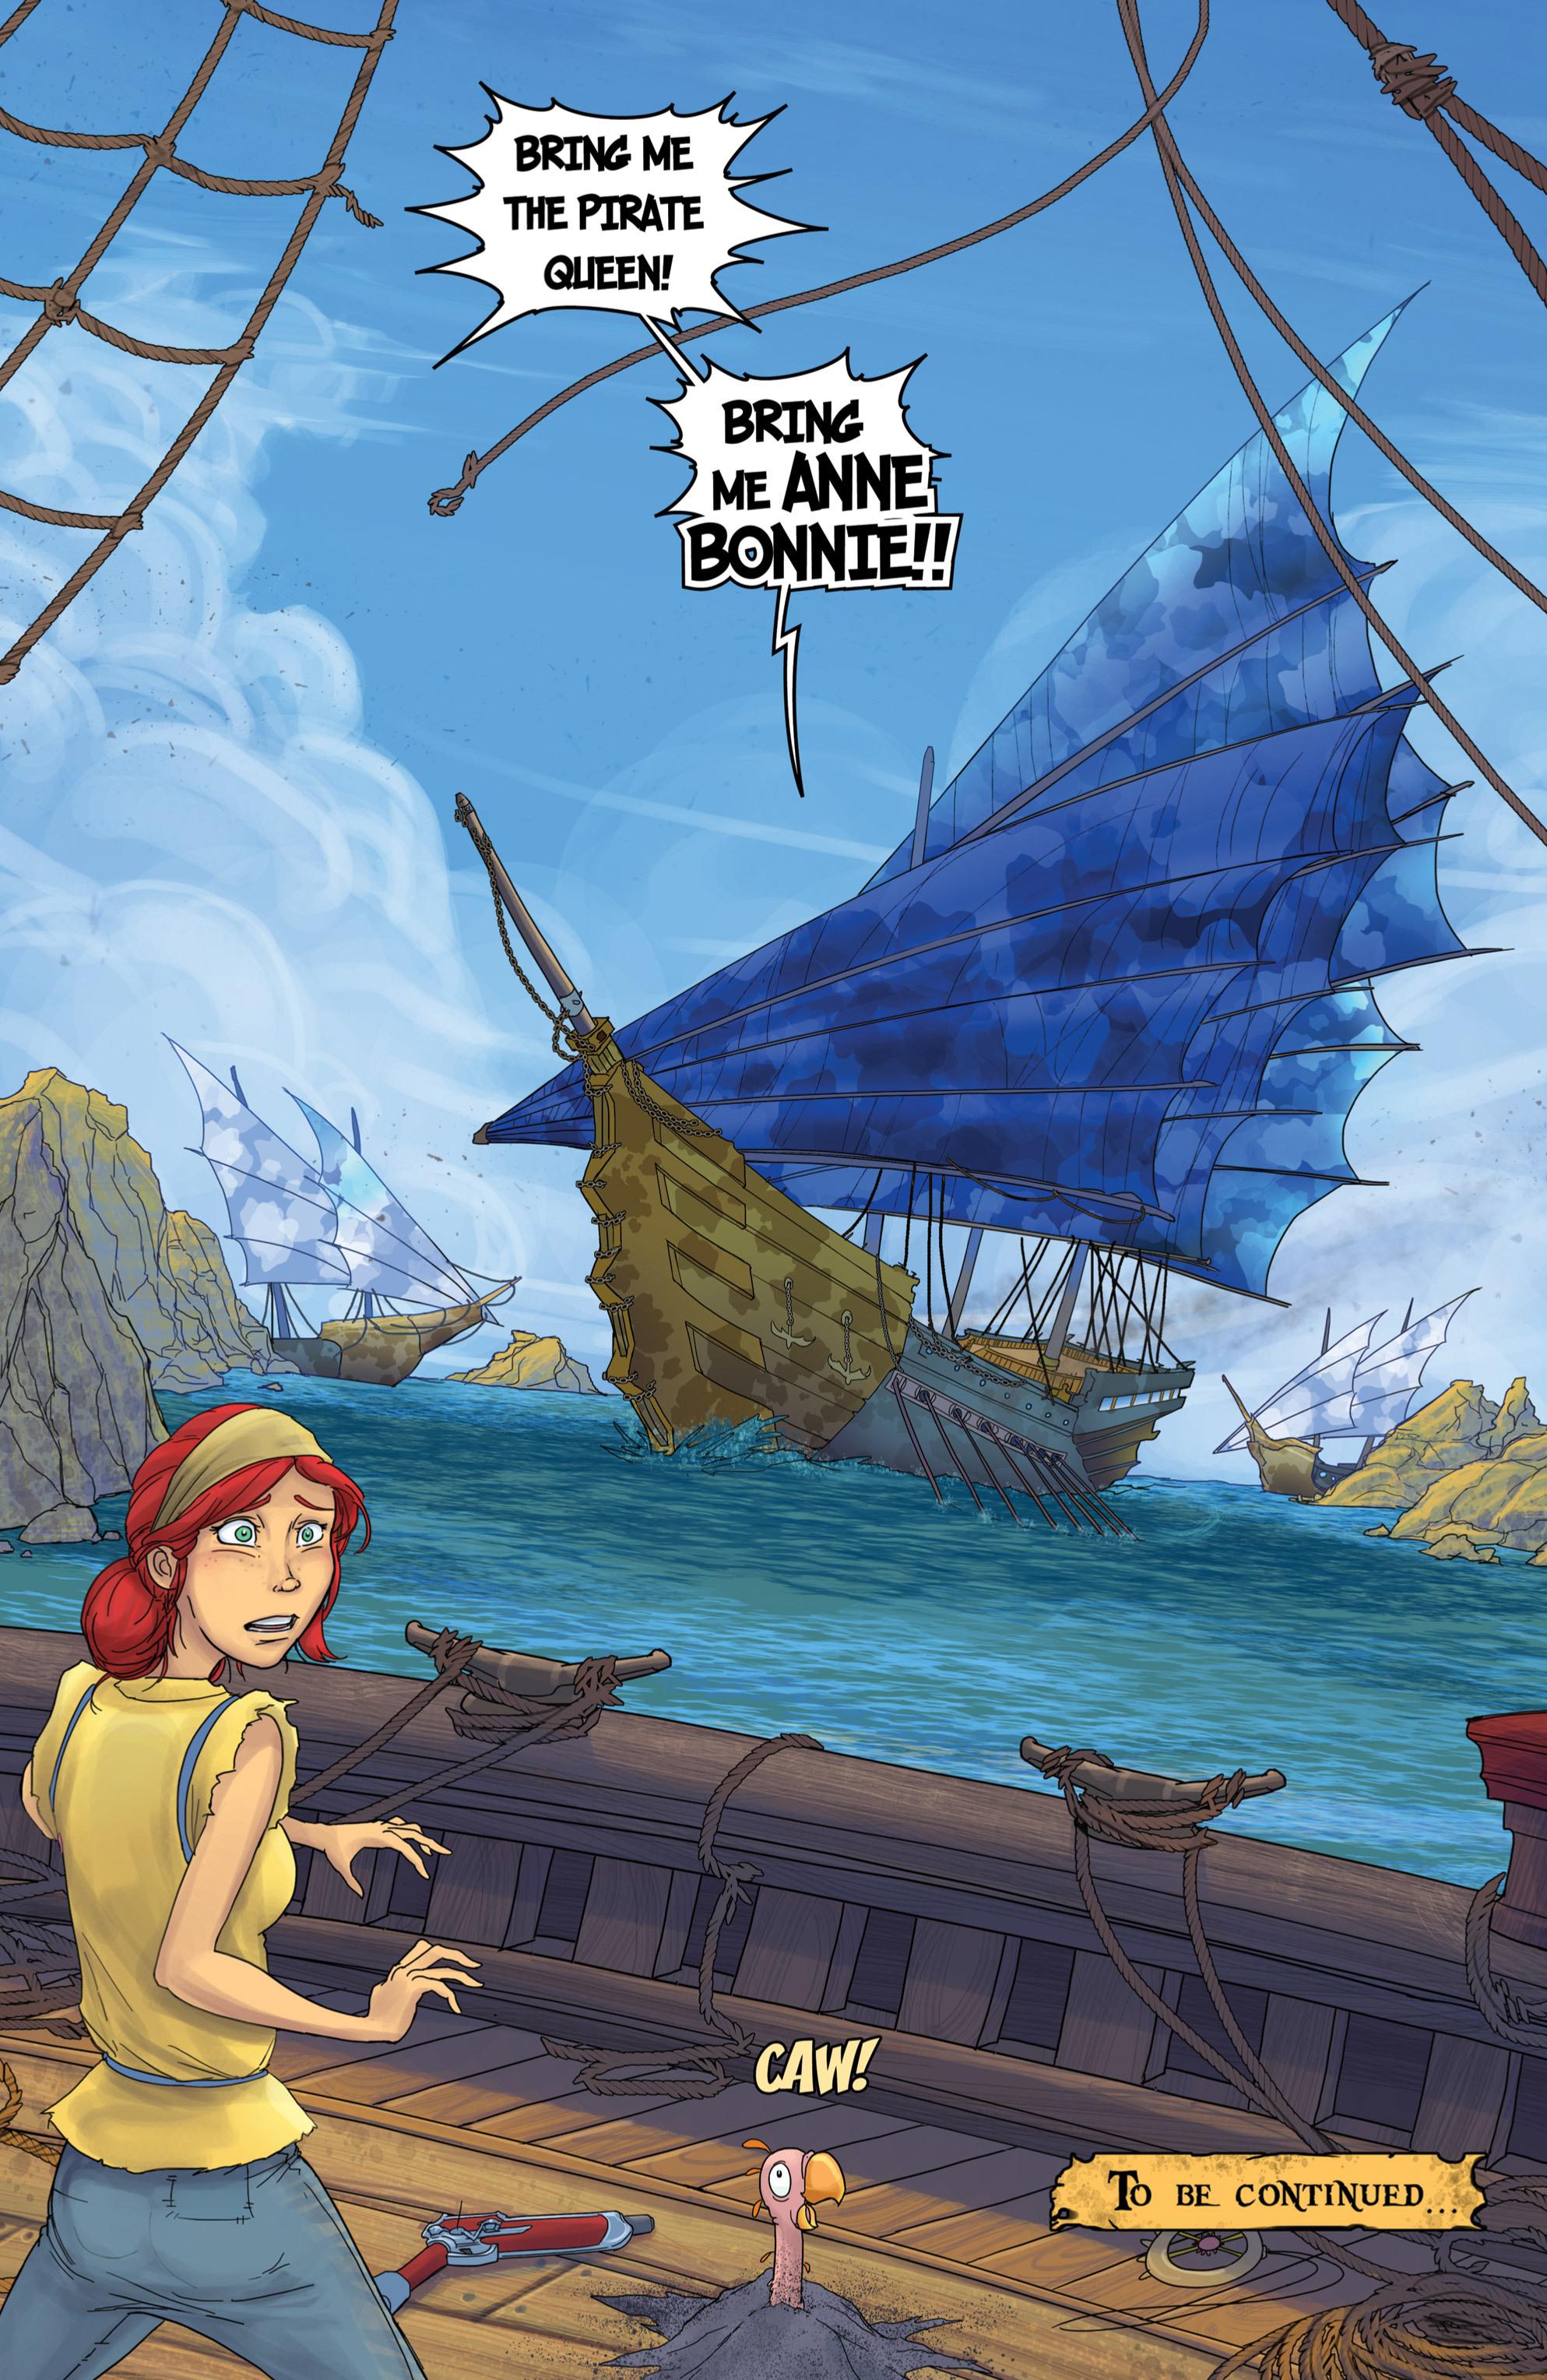 Read online Anne Bonnie comic -  Issue #1 - 29